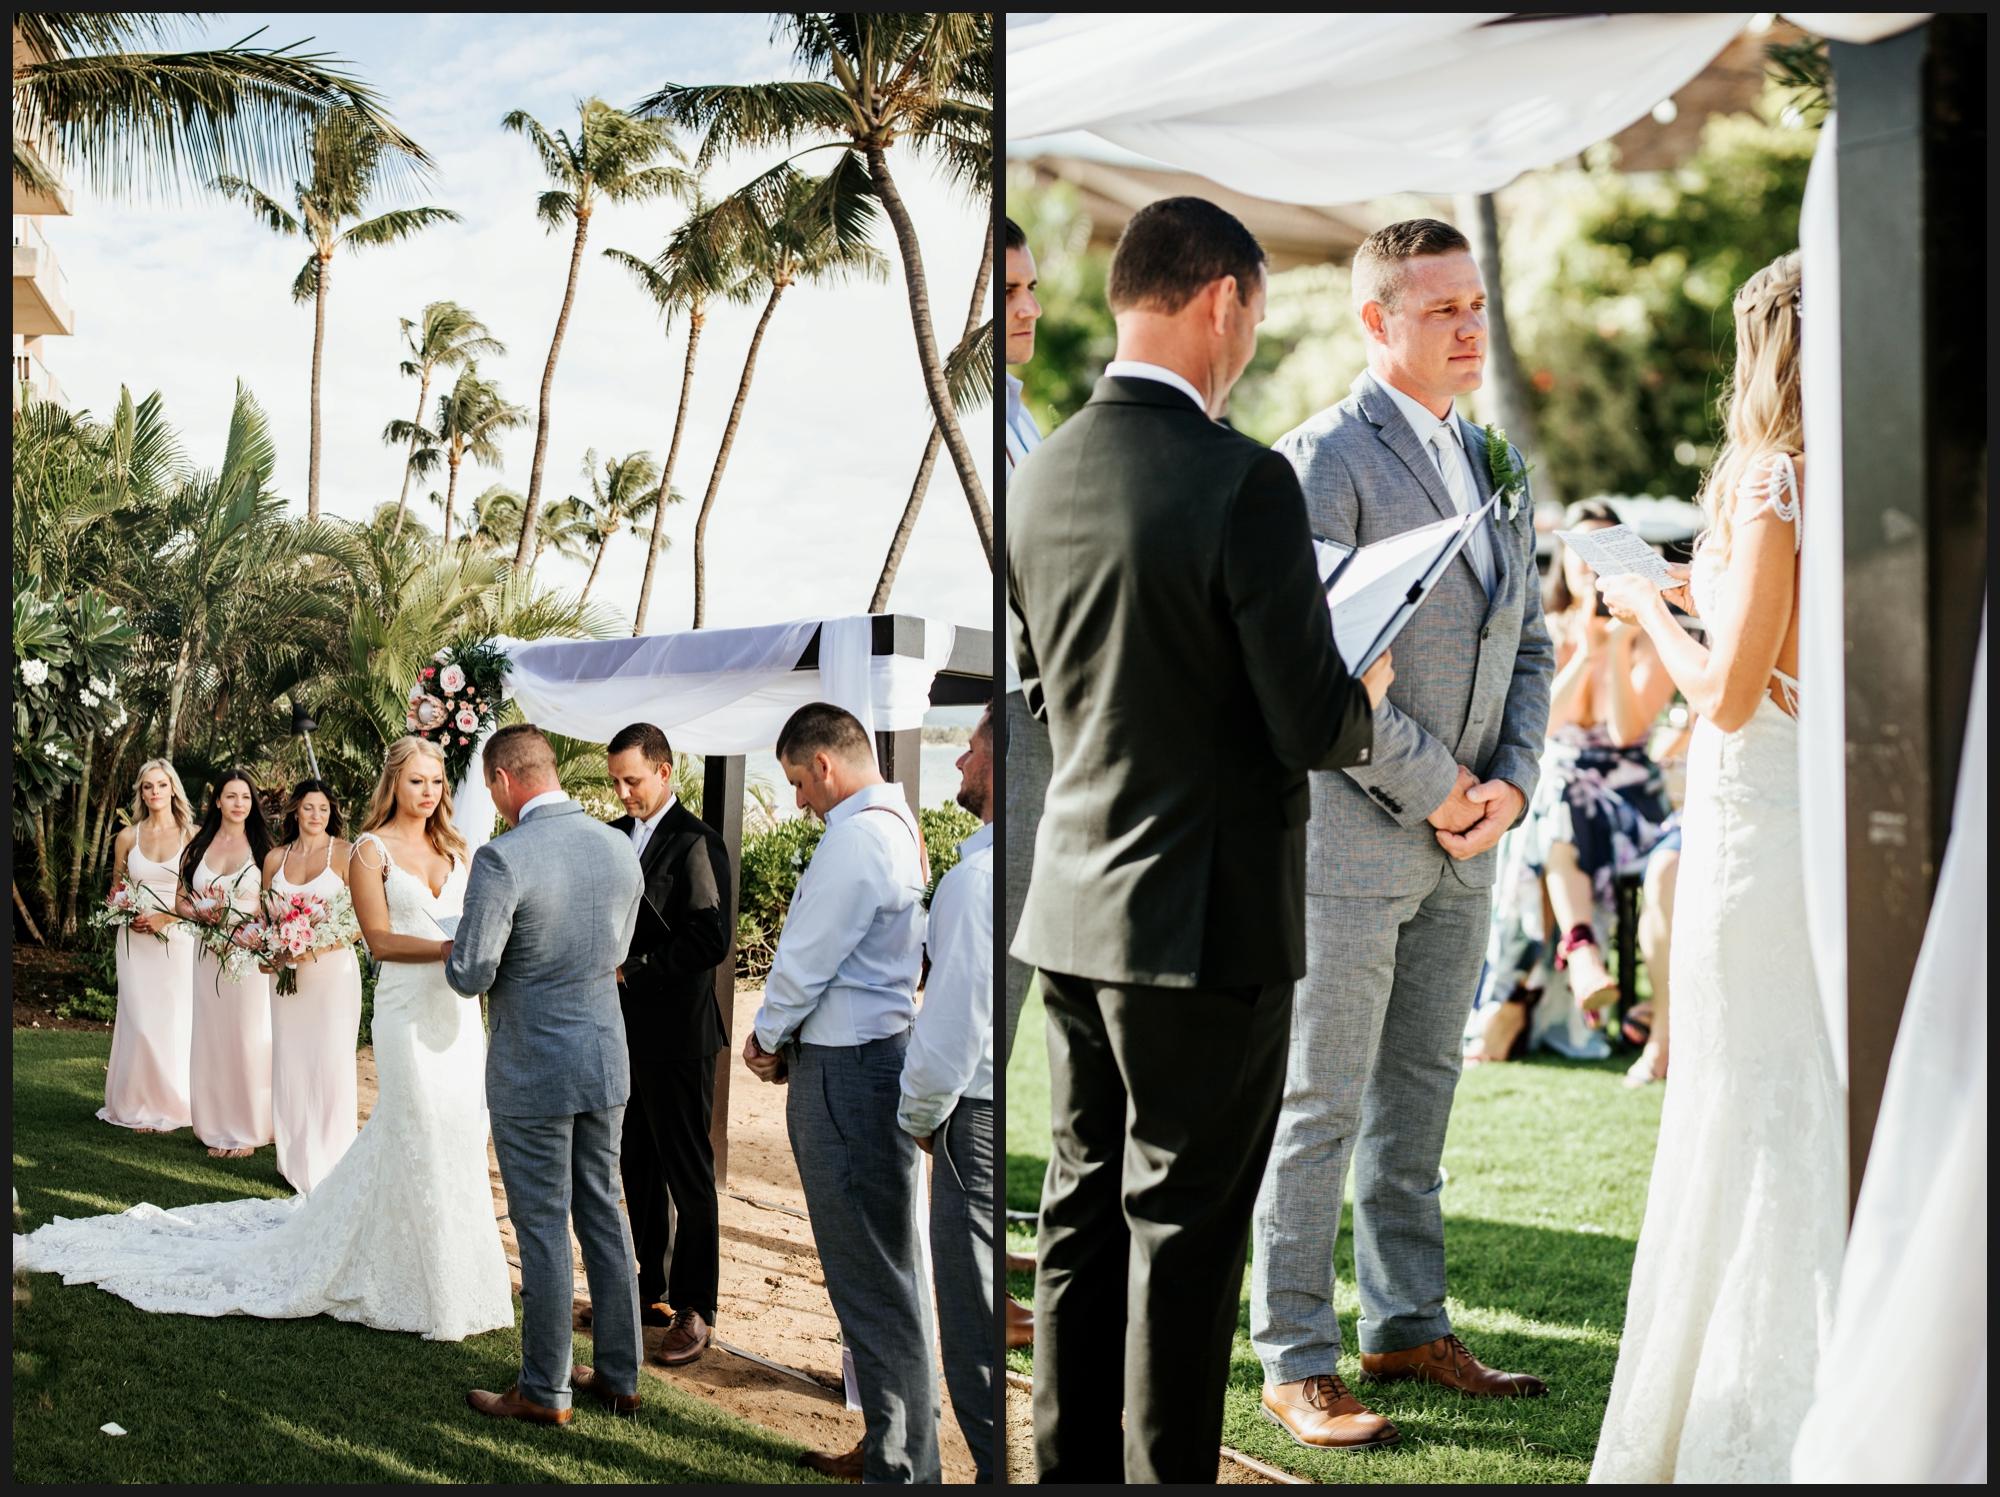 Orlando-Wedding-Photographer-destination-wedding-photographer-florida-wedding-photographer-hawaii-wedding-photographer_0013.jpg